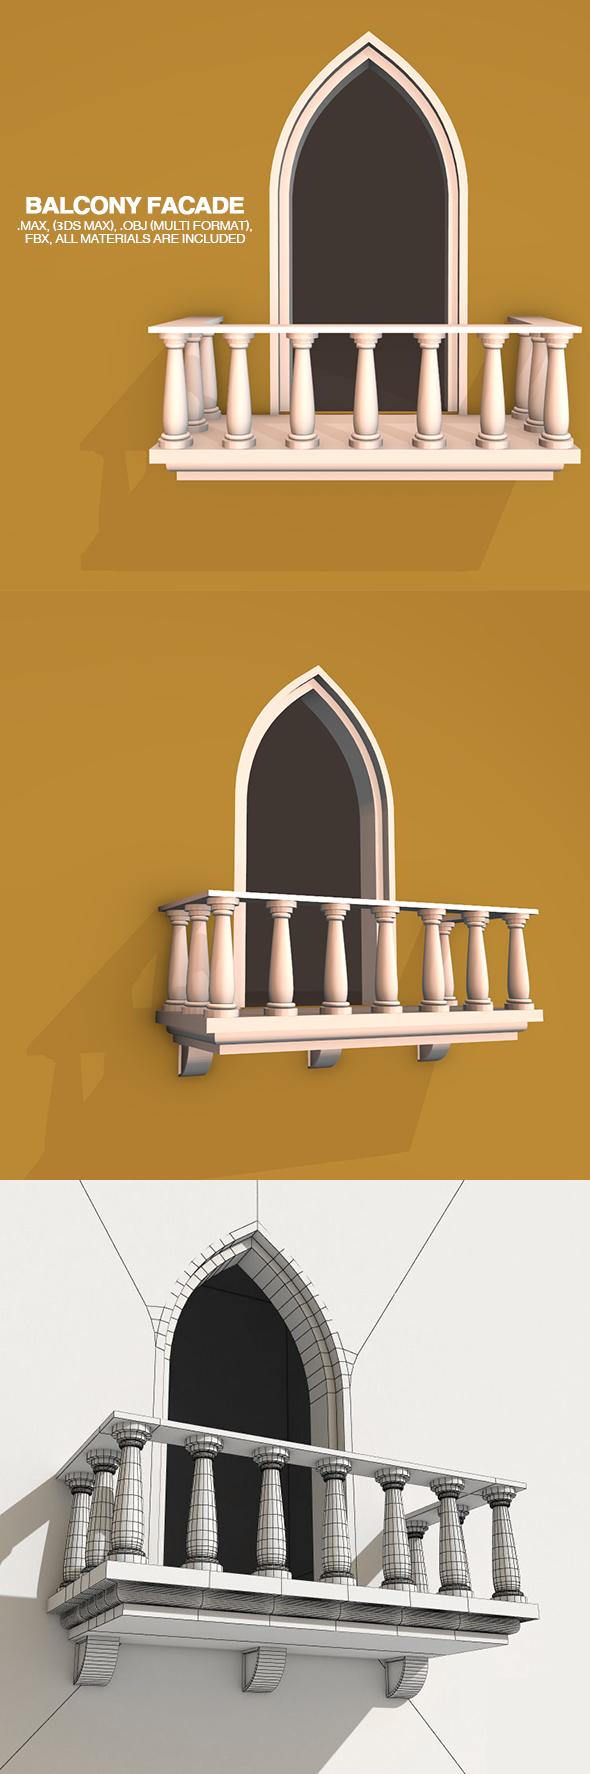 Arabic CG Textures & 3D Models from 3DOcean